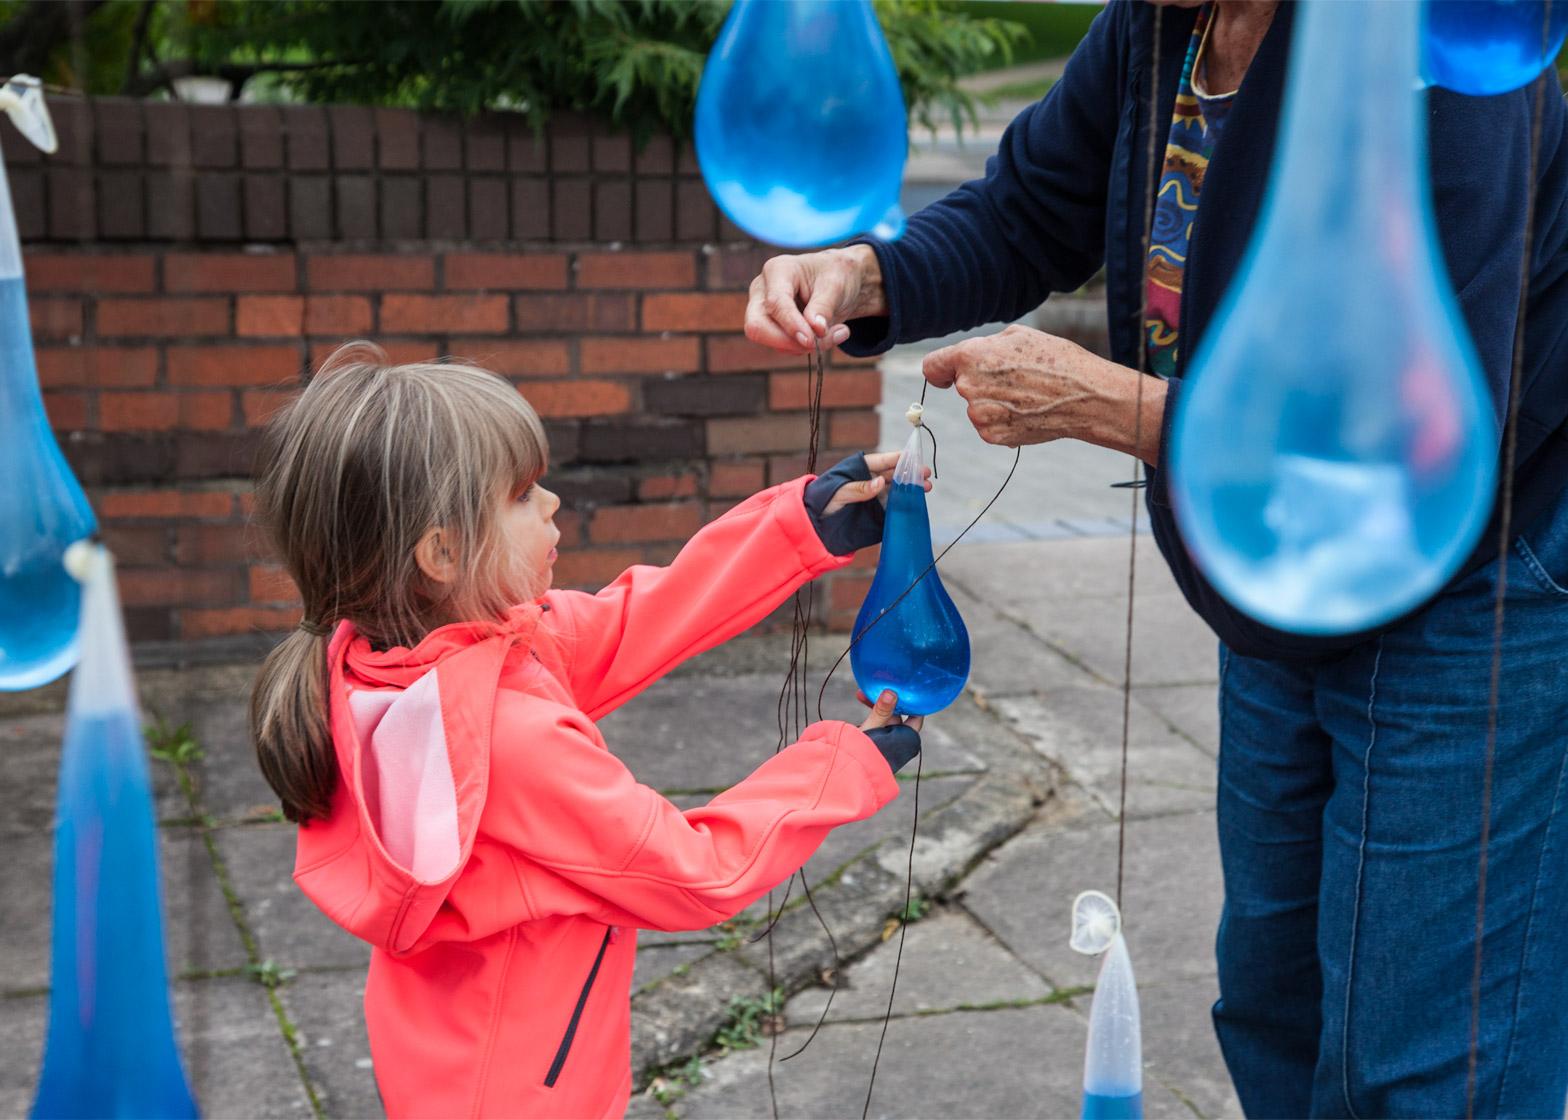 Luz-Interruptus_Rain-Interactive-installation_Condoms_Waterman-Arts-Centre_London6